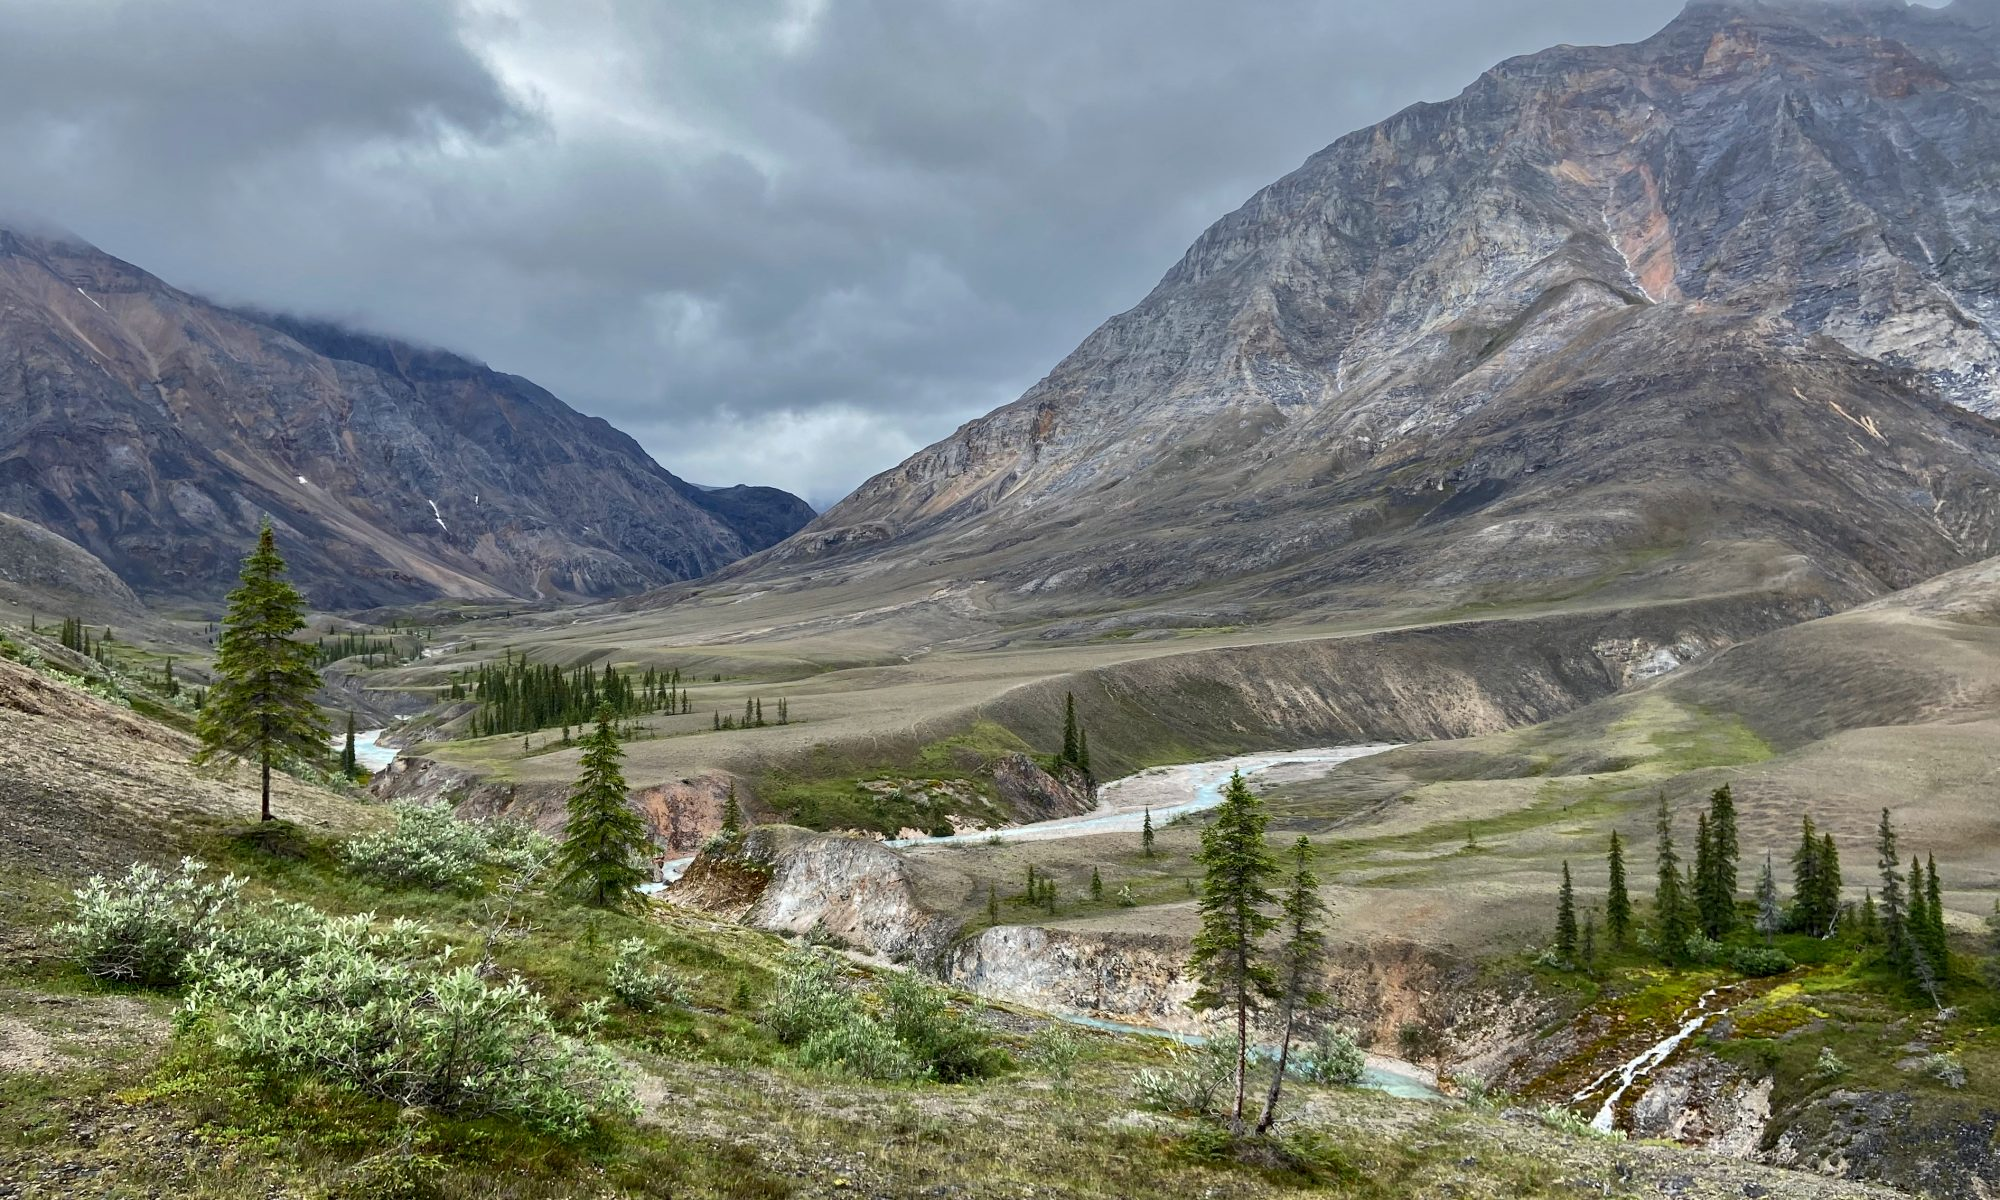 photo of the Brooks Range in Alaska